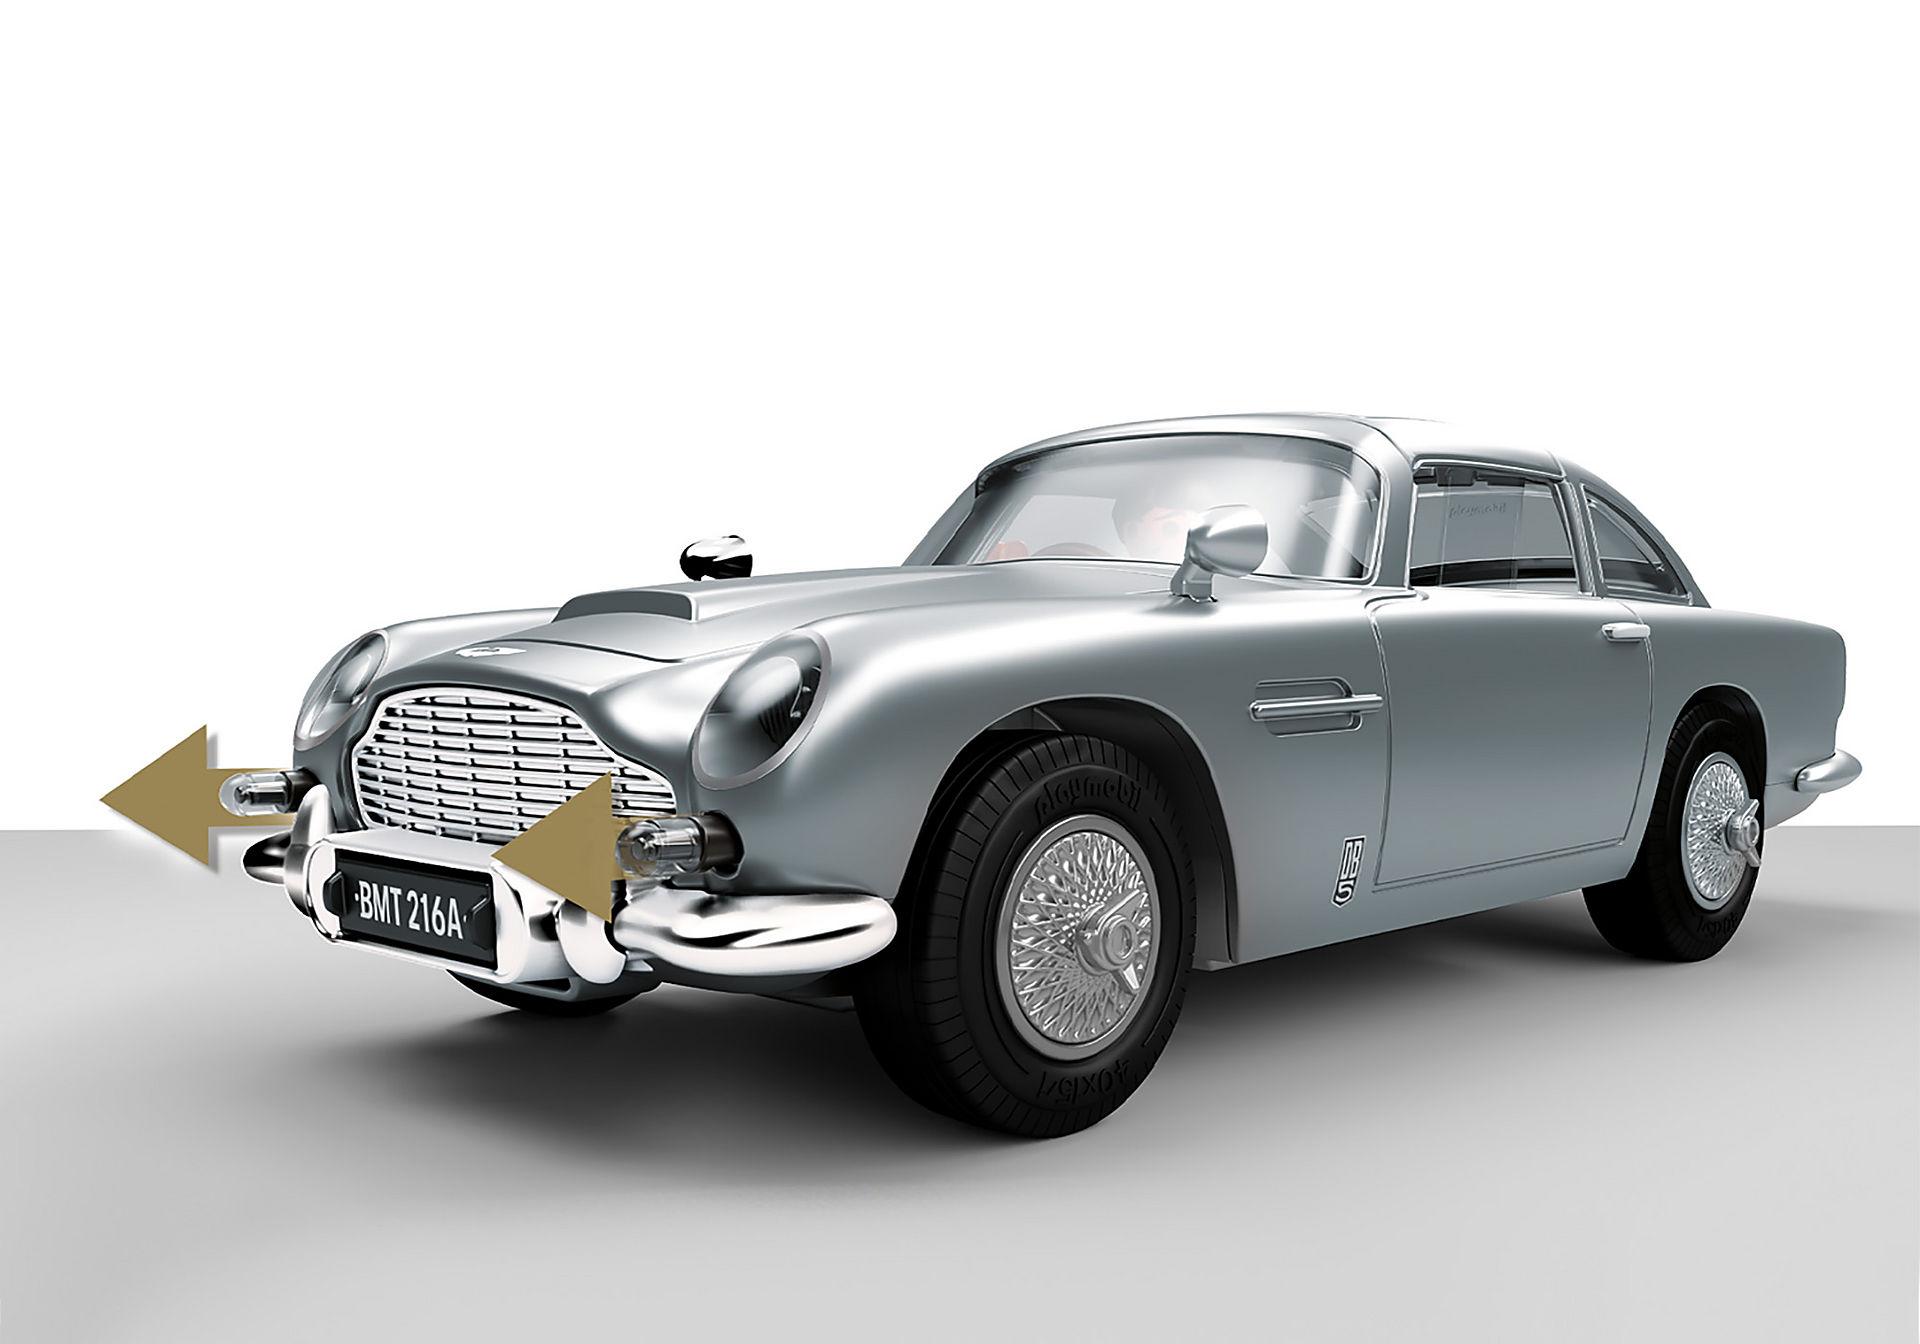 70578 James Bond Aston Martin DB5 - Edition Goldfinger zoom image5